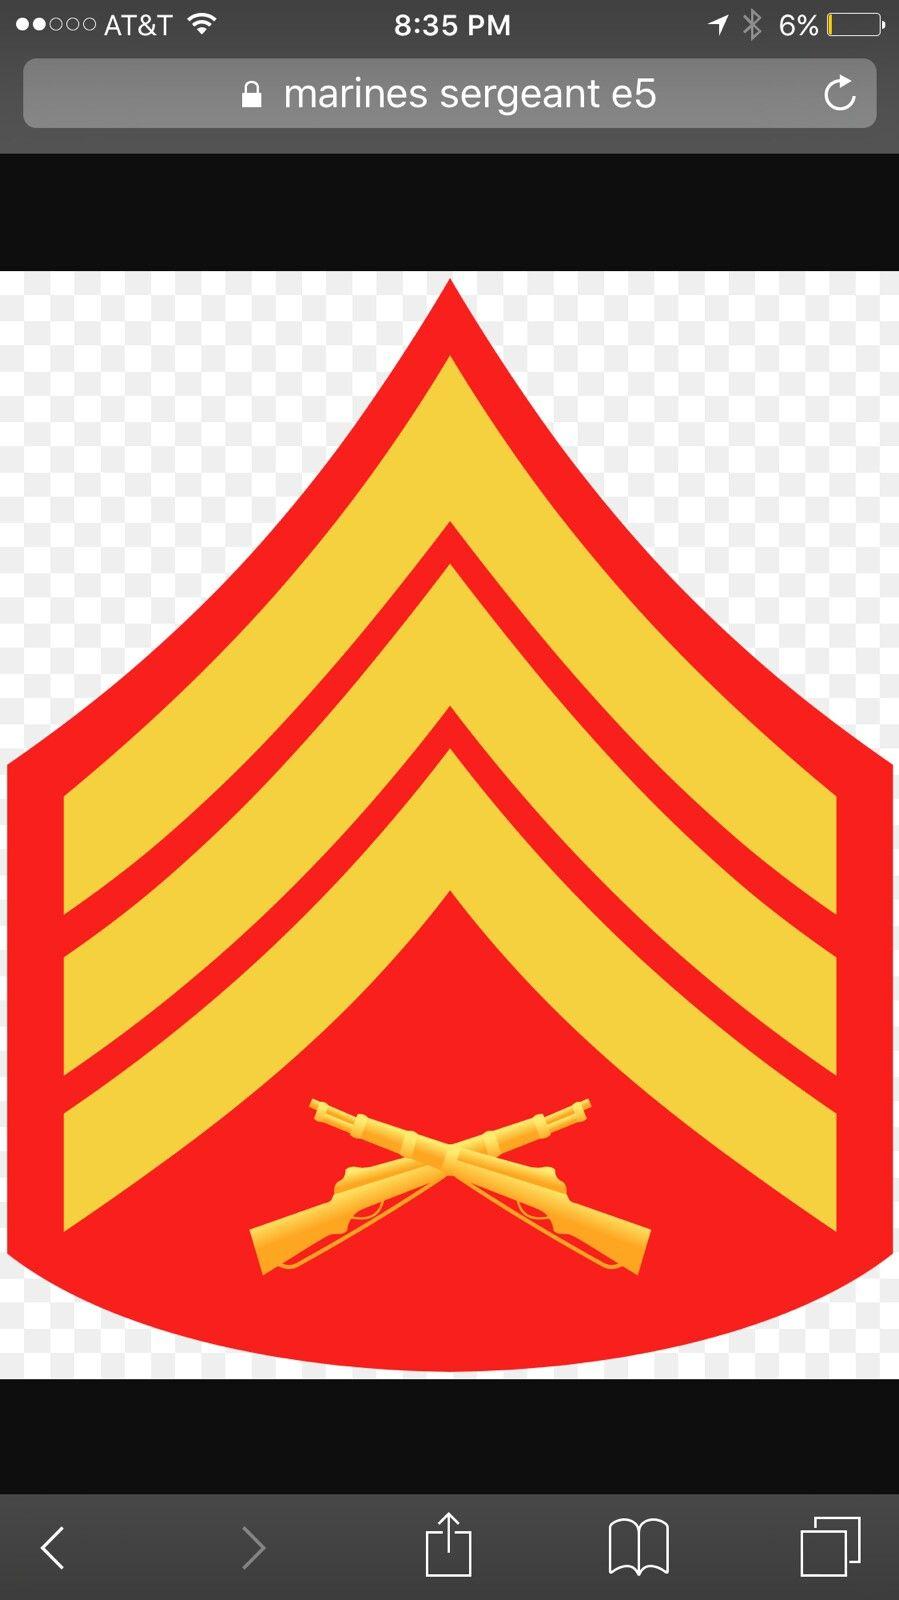 E-6 Staff Sergeant Insignia Sticker Decal Self Adhesive Vinyl usmc marine corps